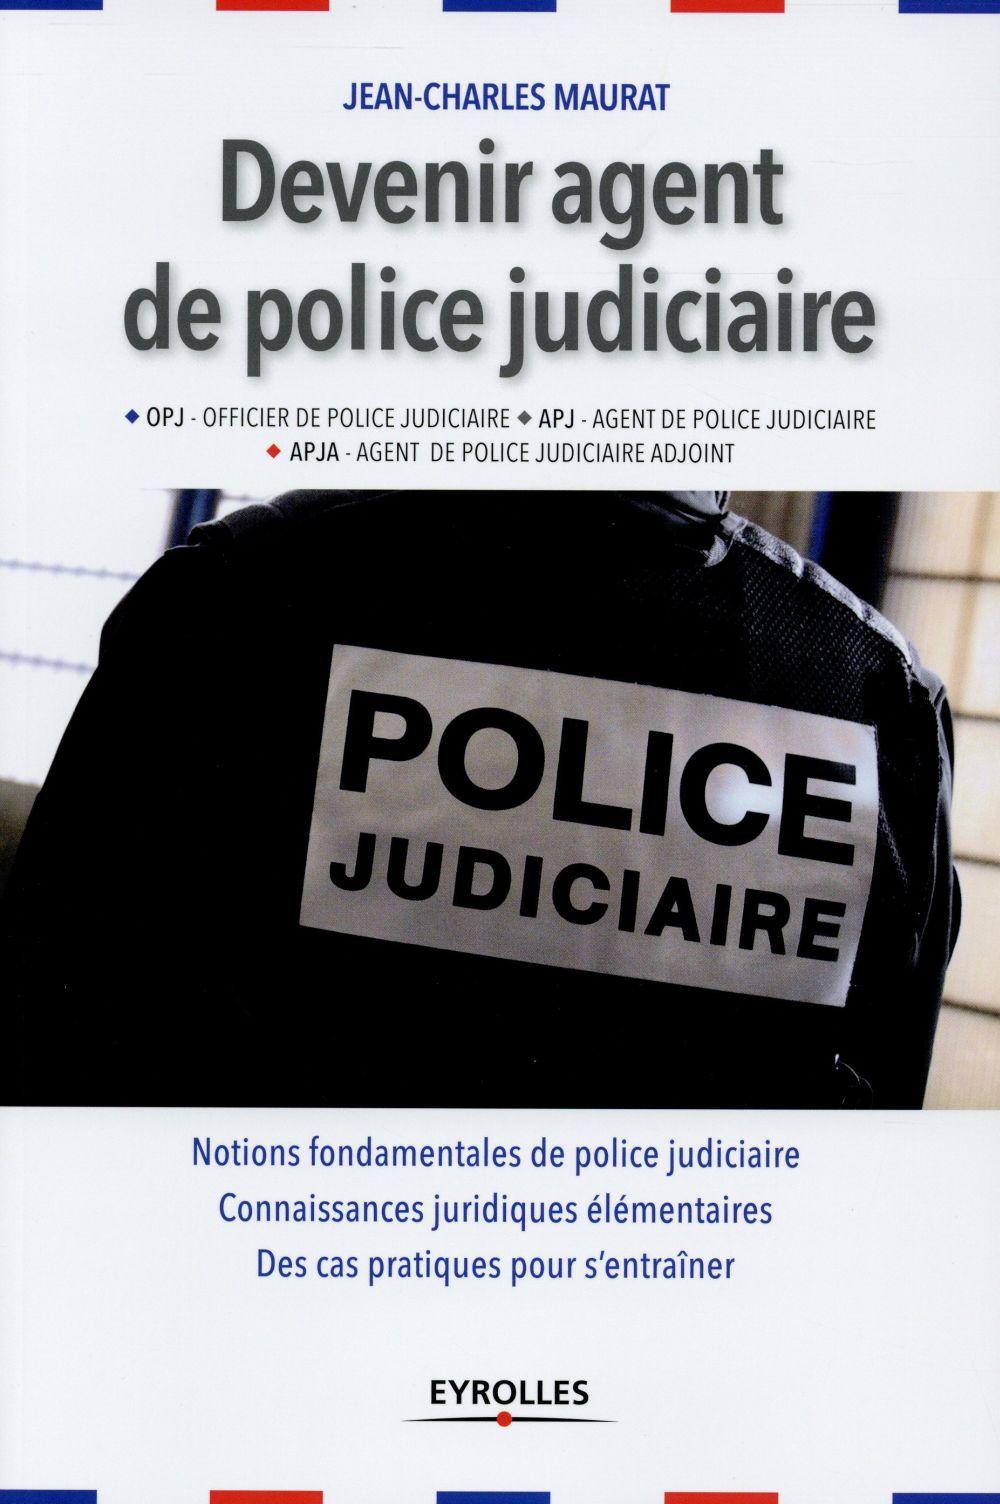 DEVENIR AGENT DE POLICE JUDICIAIRE - OPJ, APJ, APJA . NOTIONS FONDAMENTALES DE POLICE JUDICIAIRE. CO